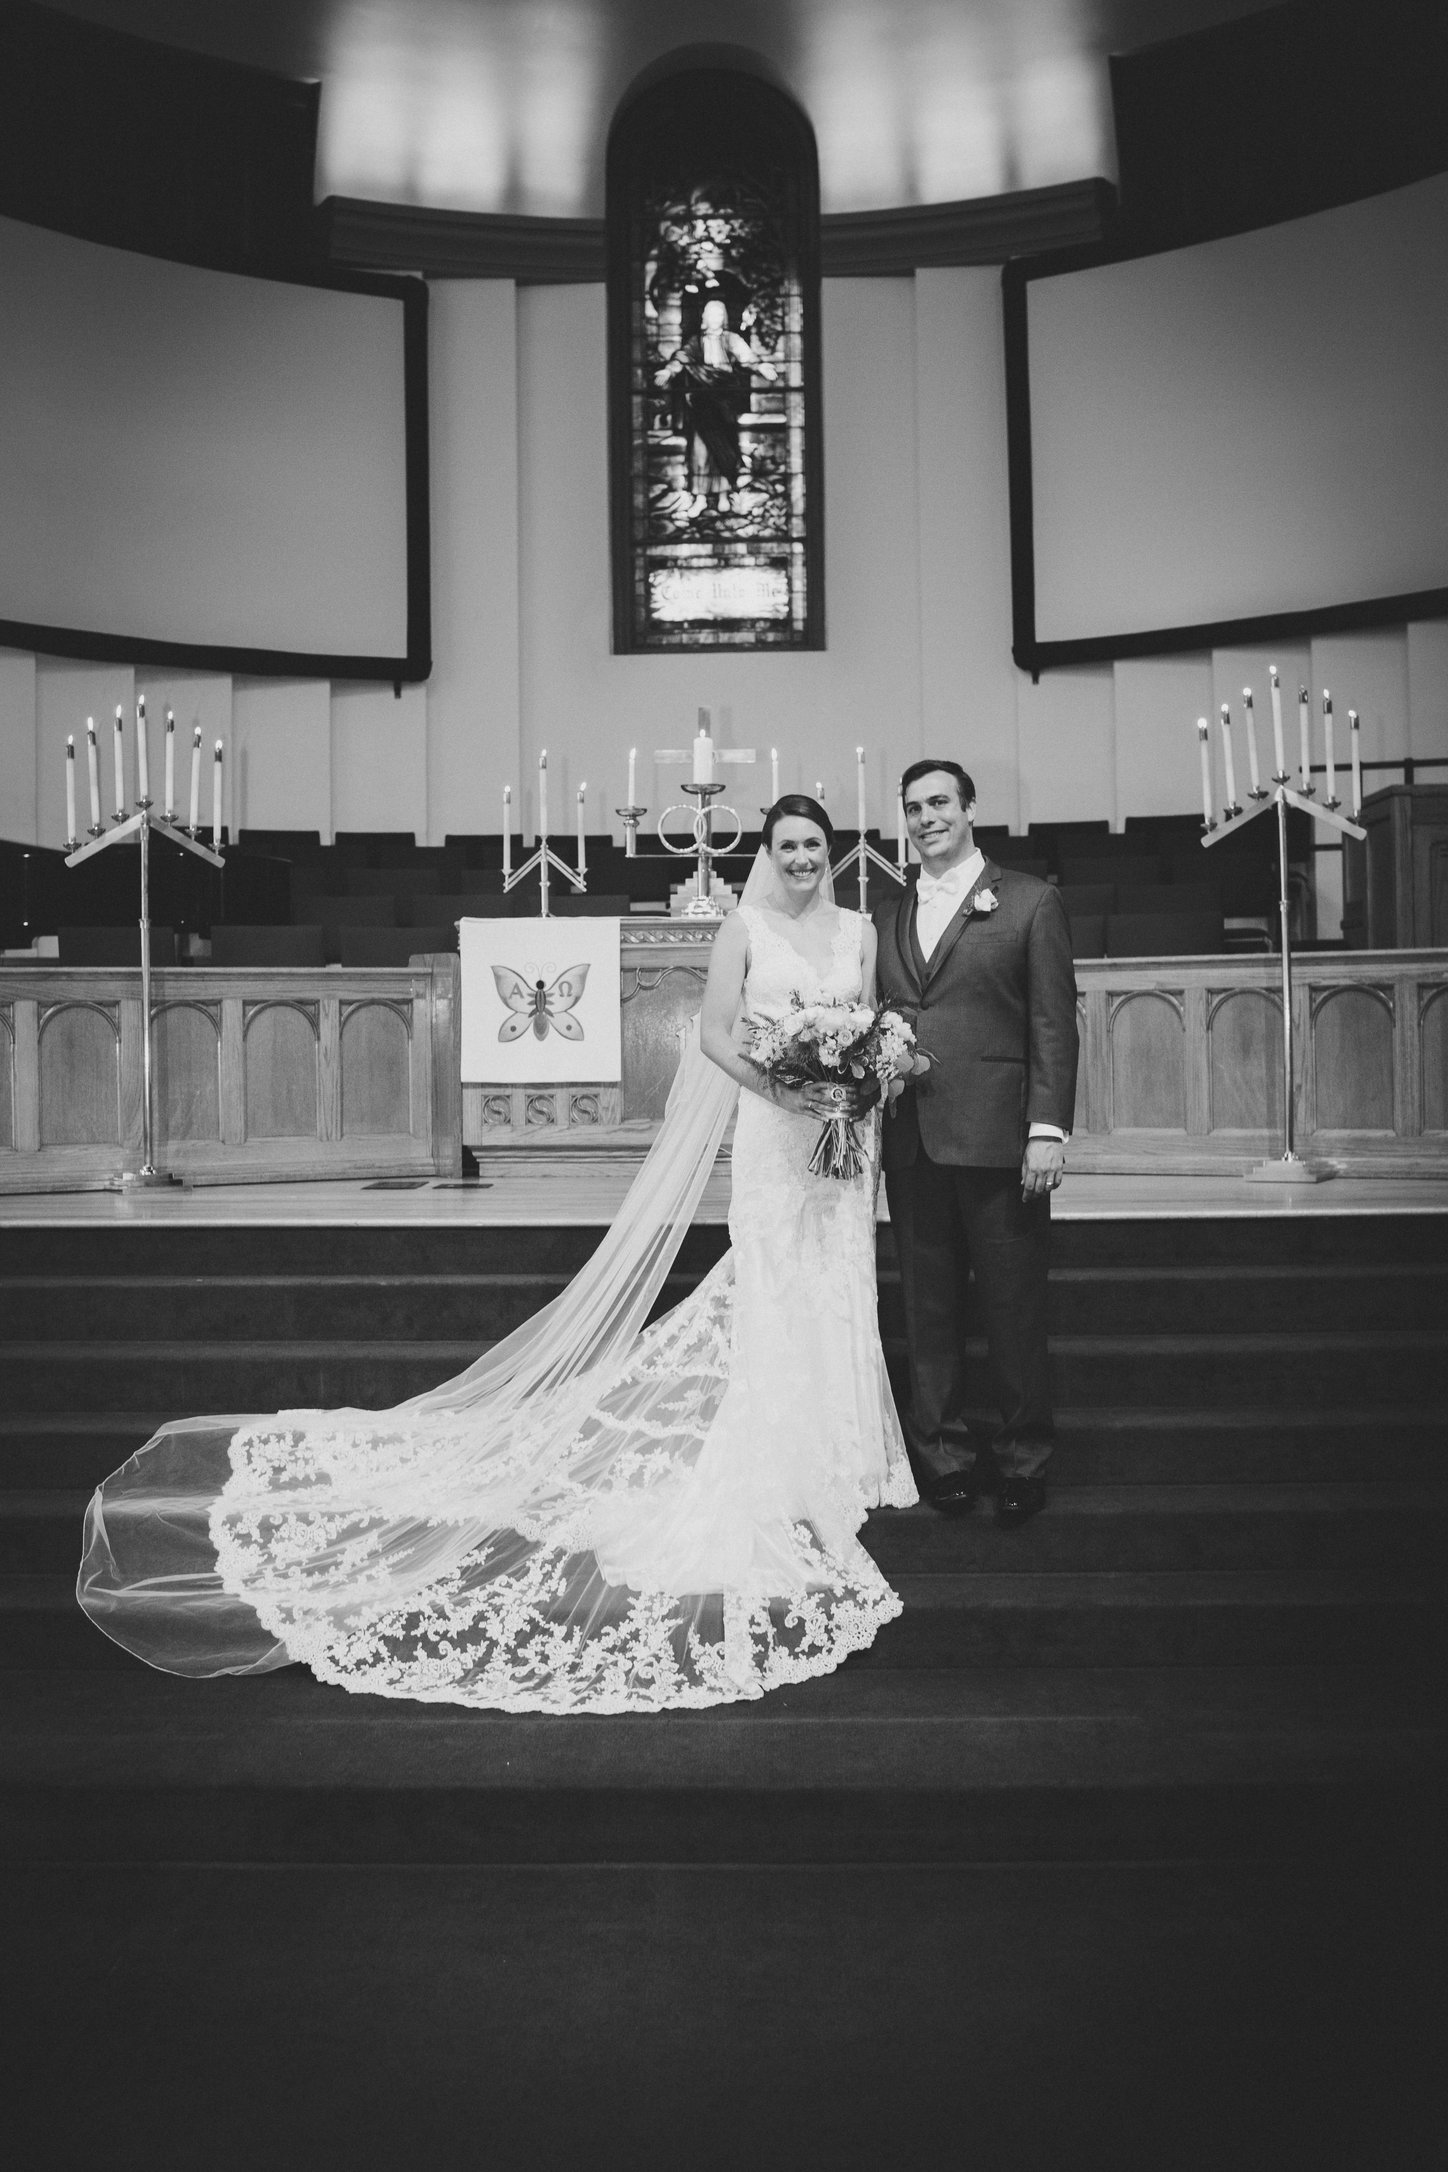 SandC-wedding-297.jpg